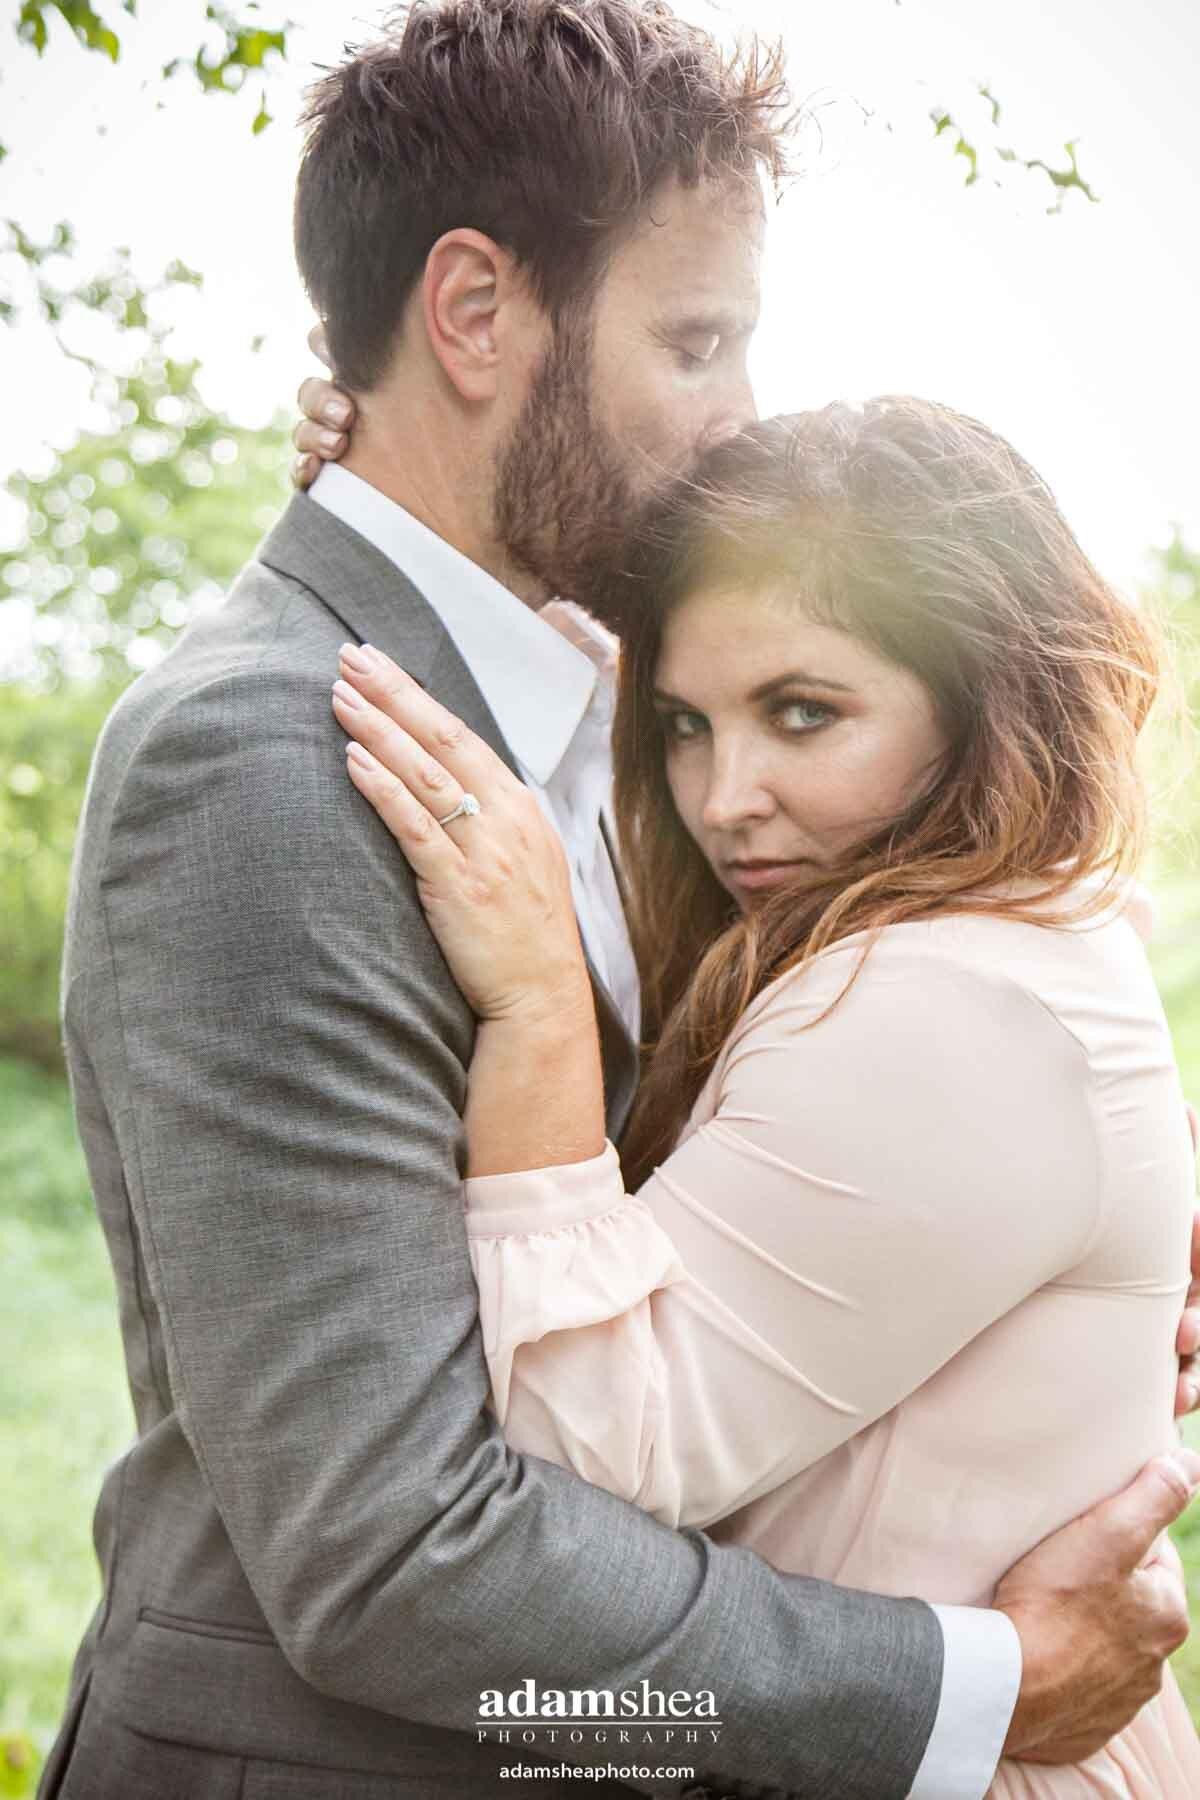 amy-adam-engagement-photos-larsen-wi-neenah-winding-trail-flowy-dress-grey-suit-adam-shea-photography-green-bay-appleton-neenah-photographer-14.jpg